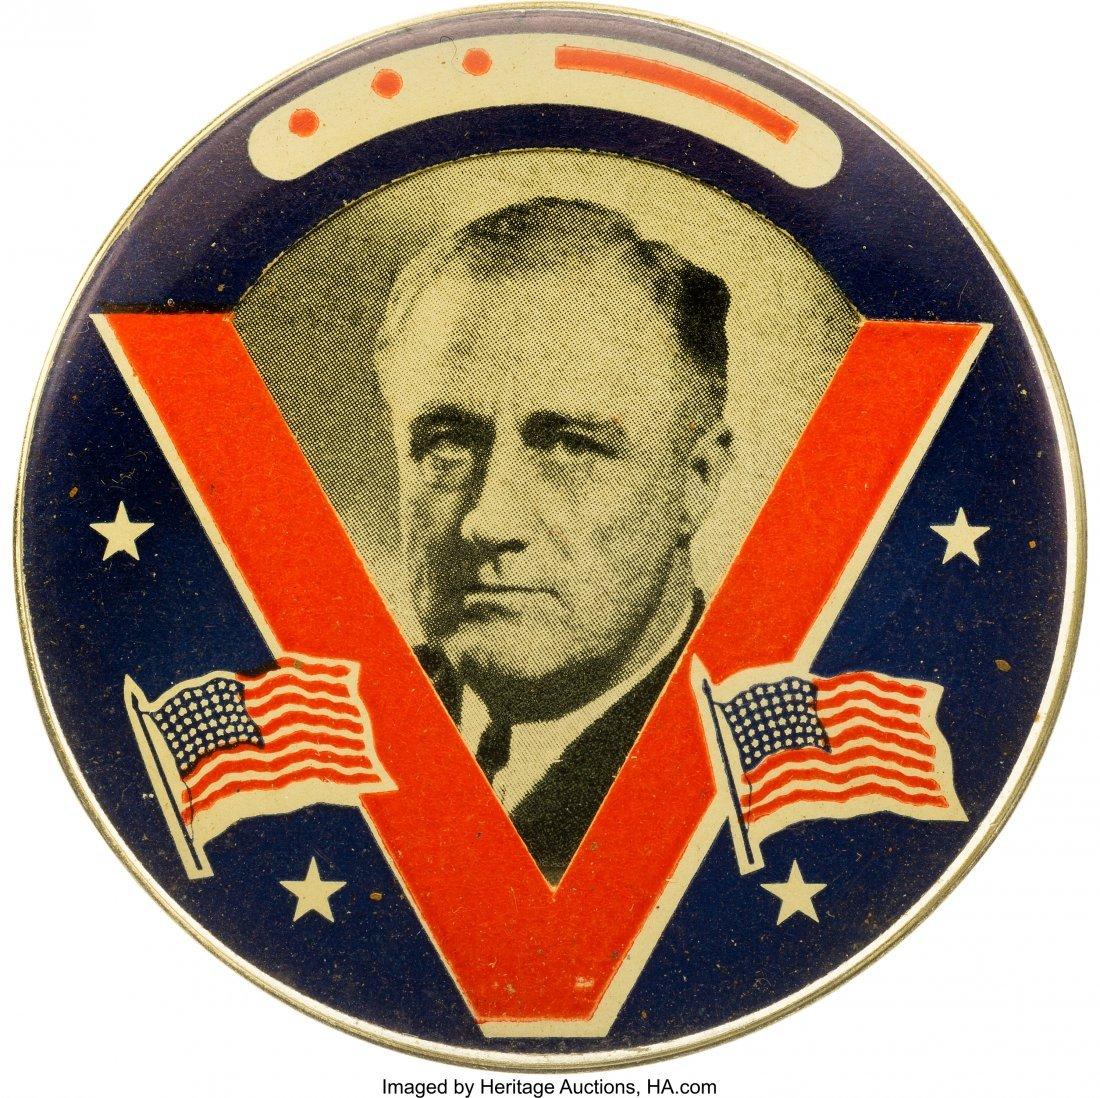 43583: Franklin D. Roosevelt: Rare World War II Victory